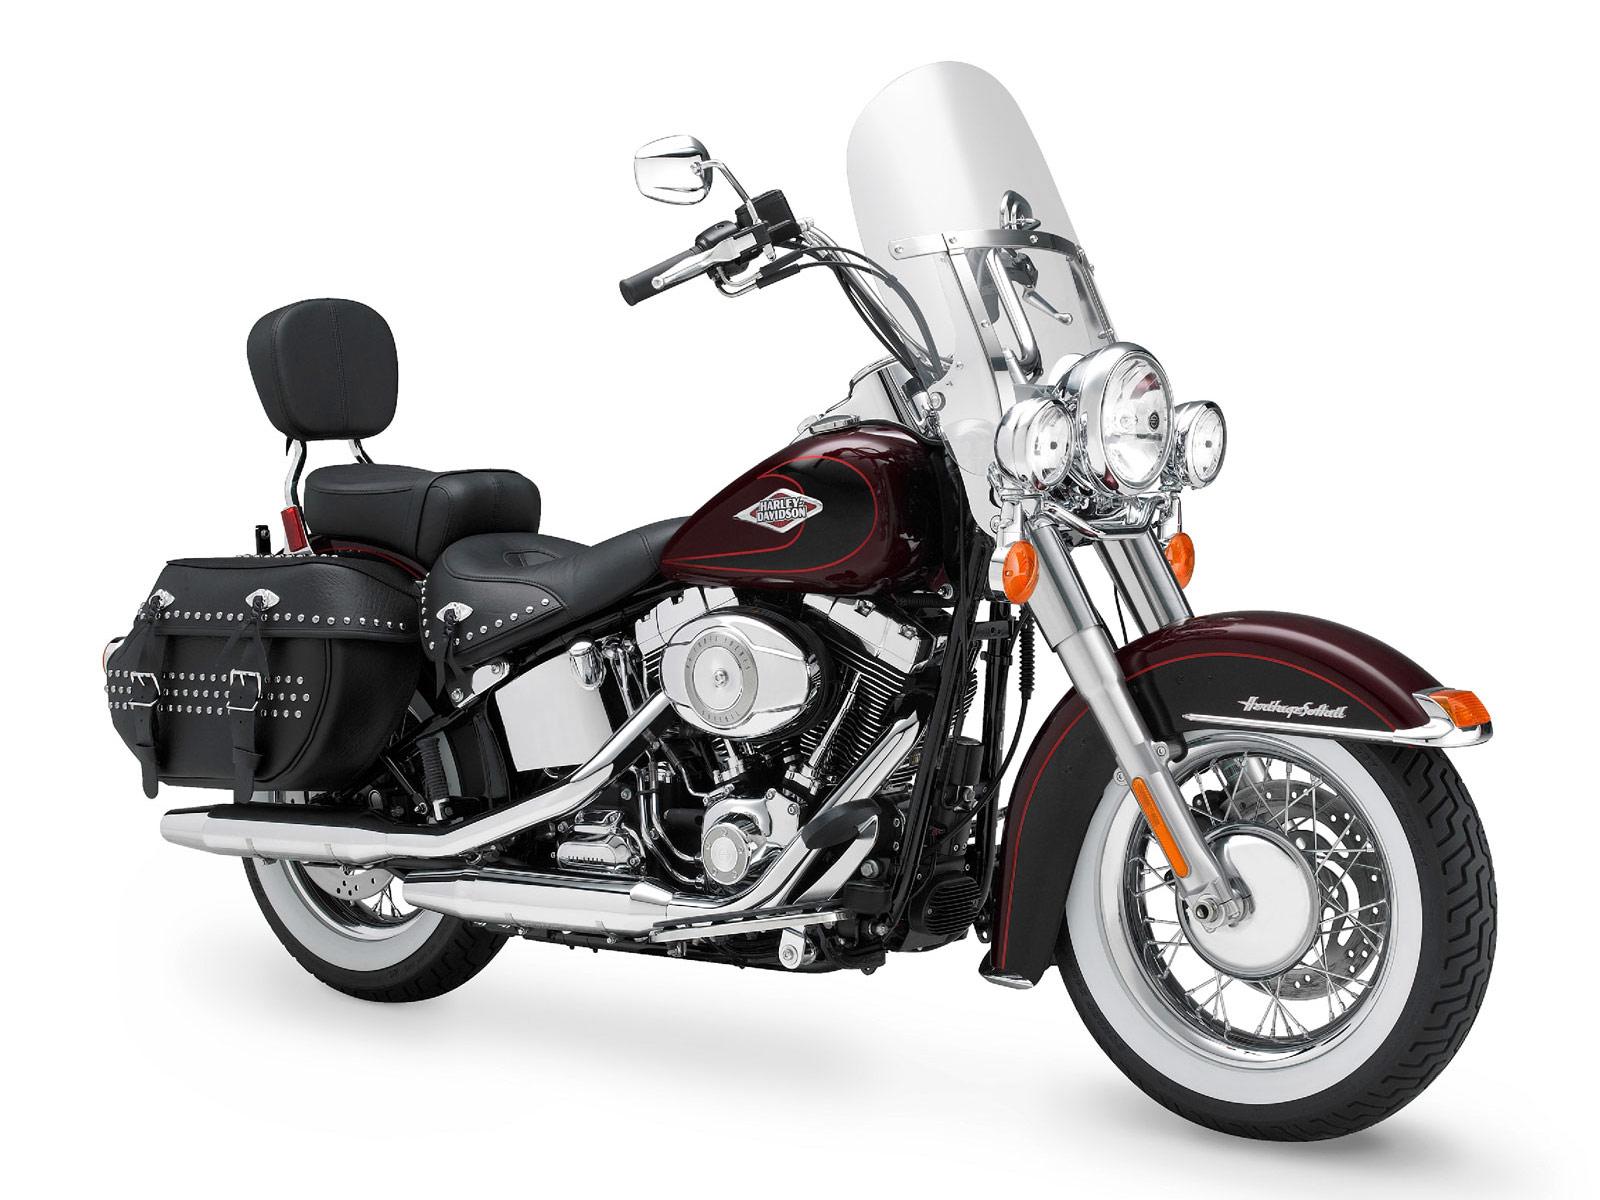 Harley Davidson Softail: MOTORCYCLE BIG BIKE: 2011 Harley Davidson FLSTC Heritage